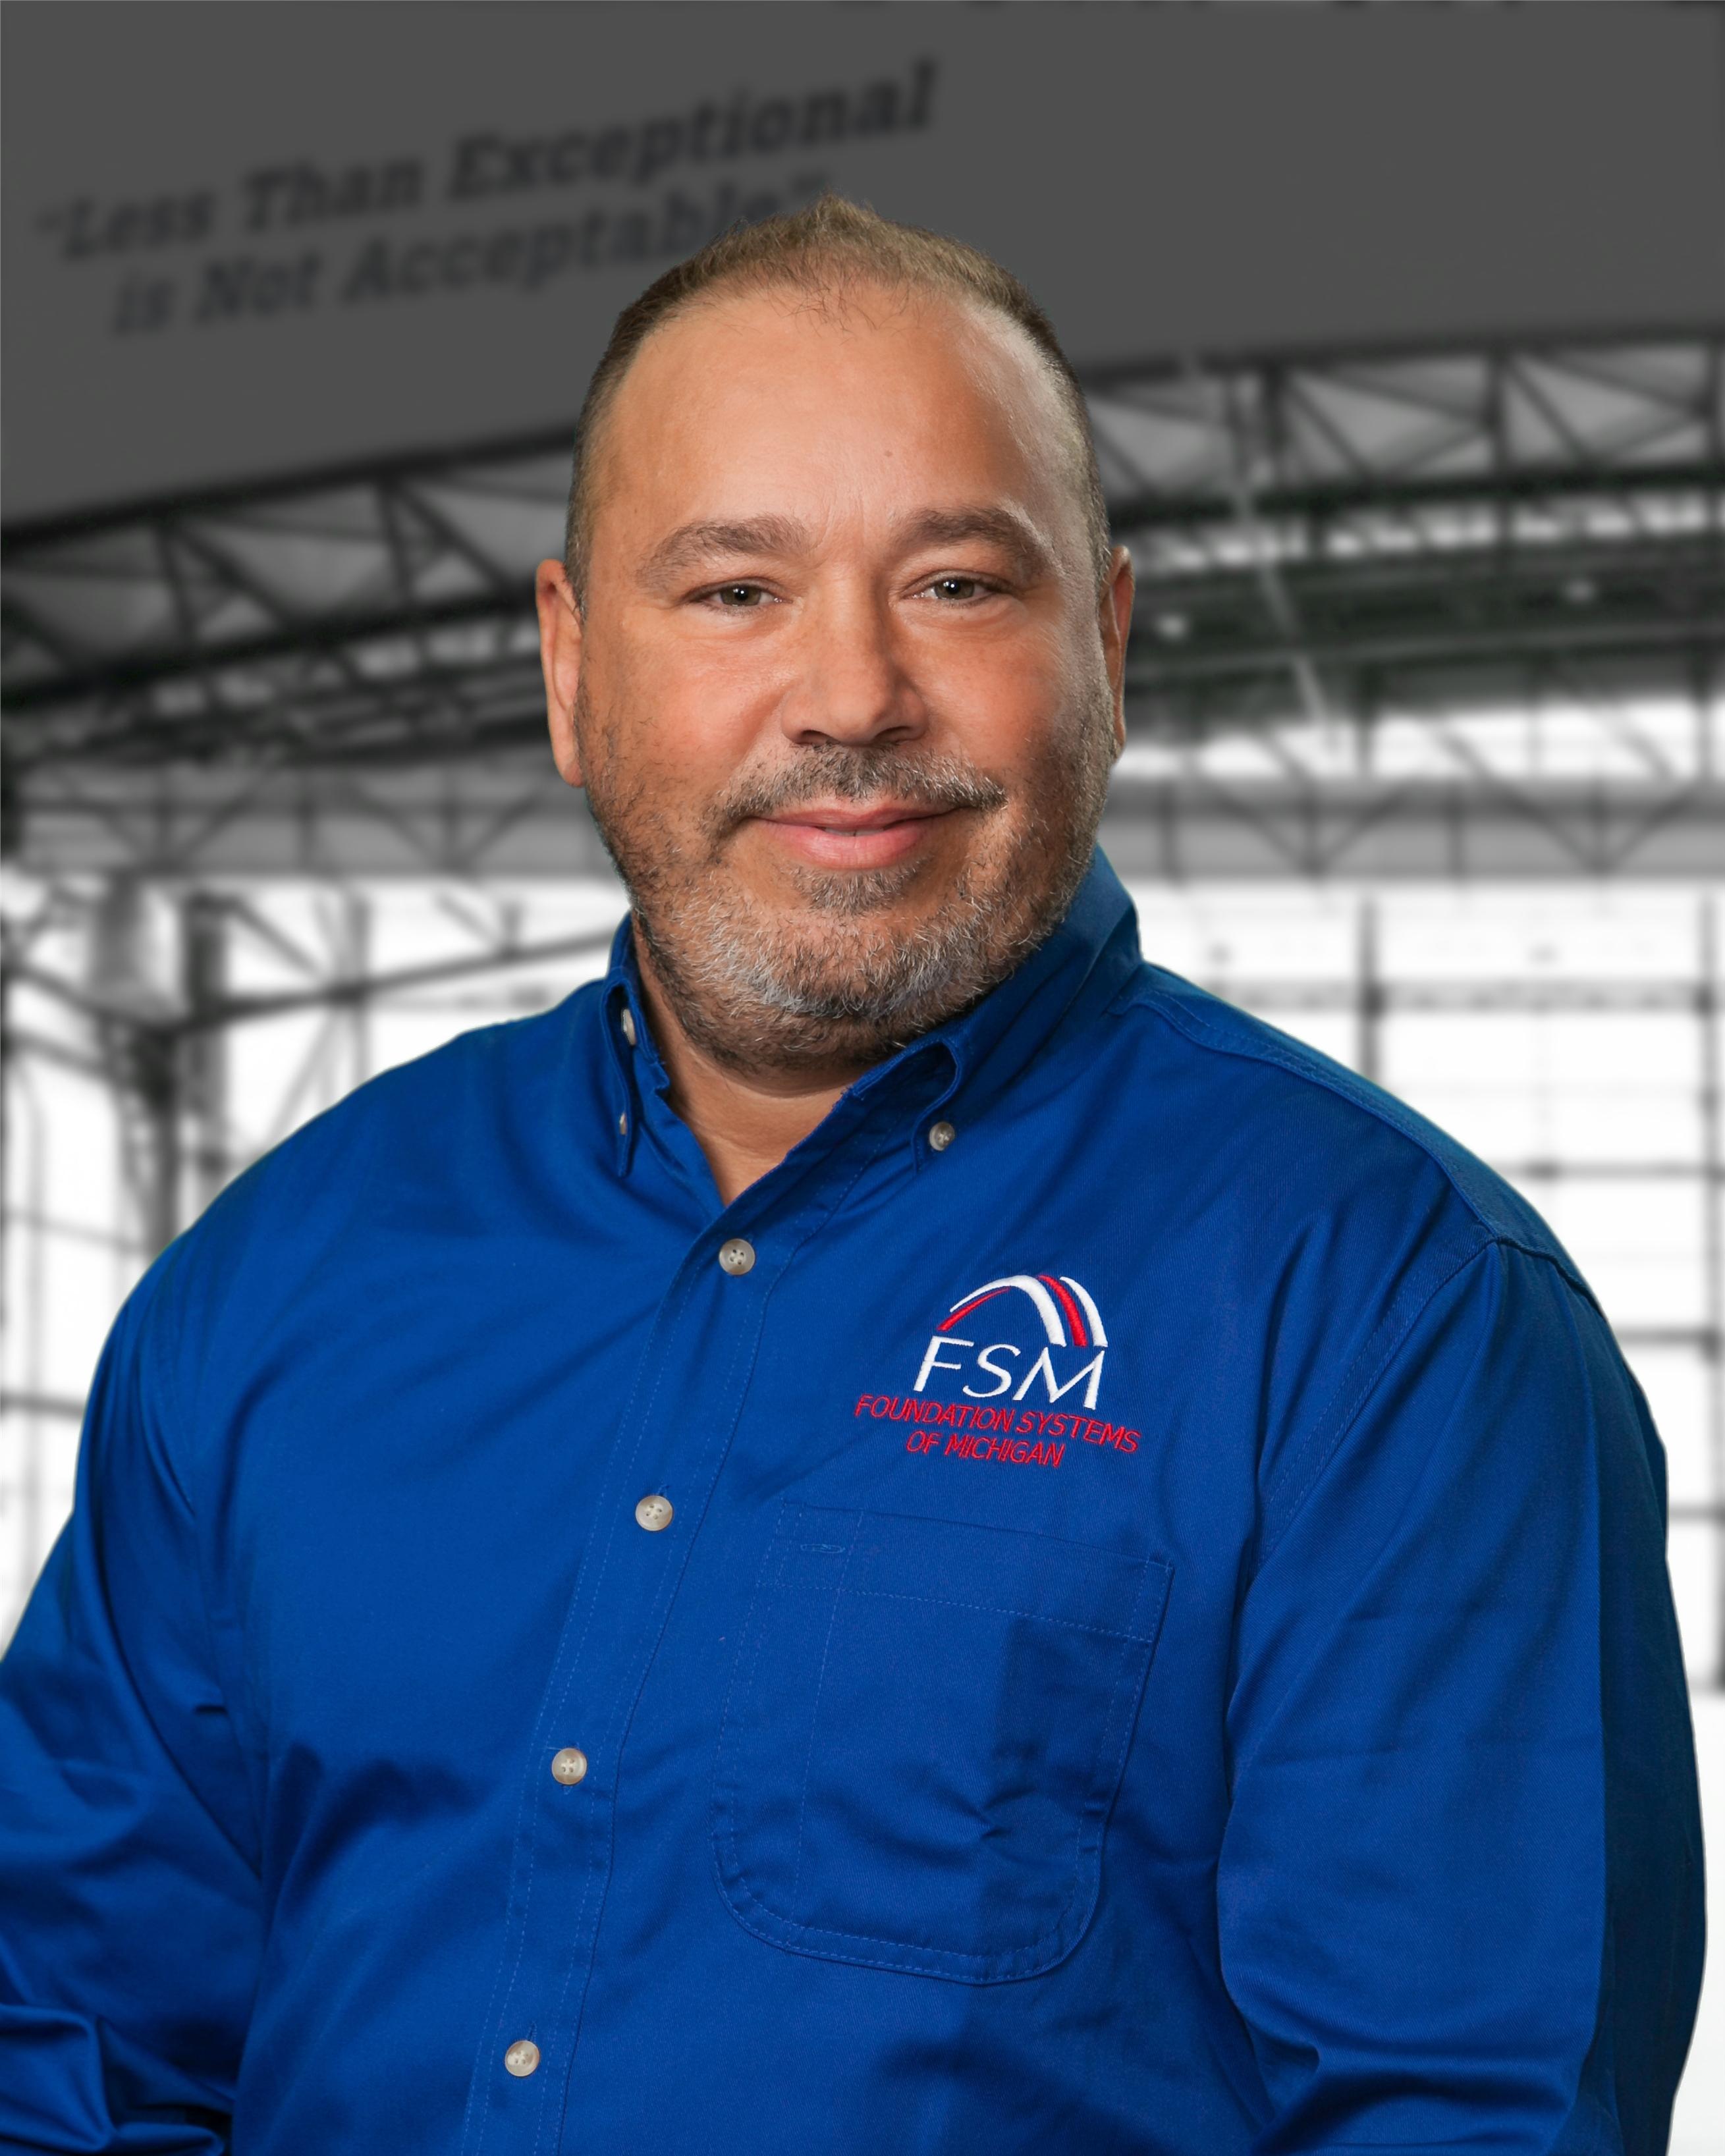 FSM Jeff Hunter Master Plumber